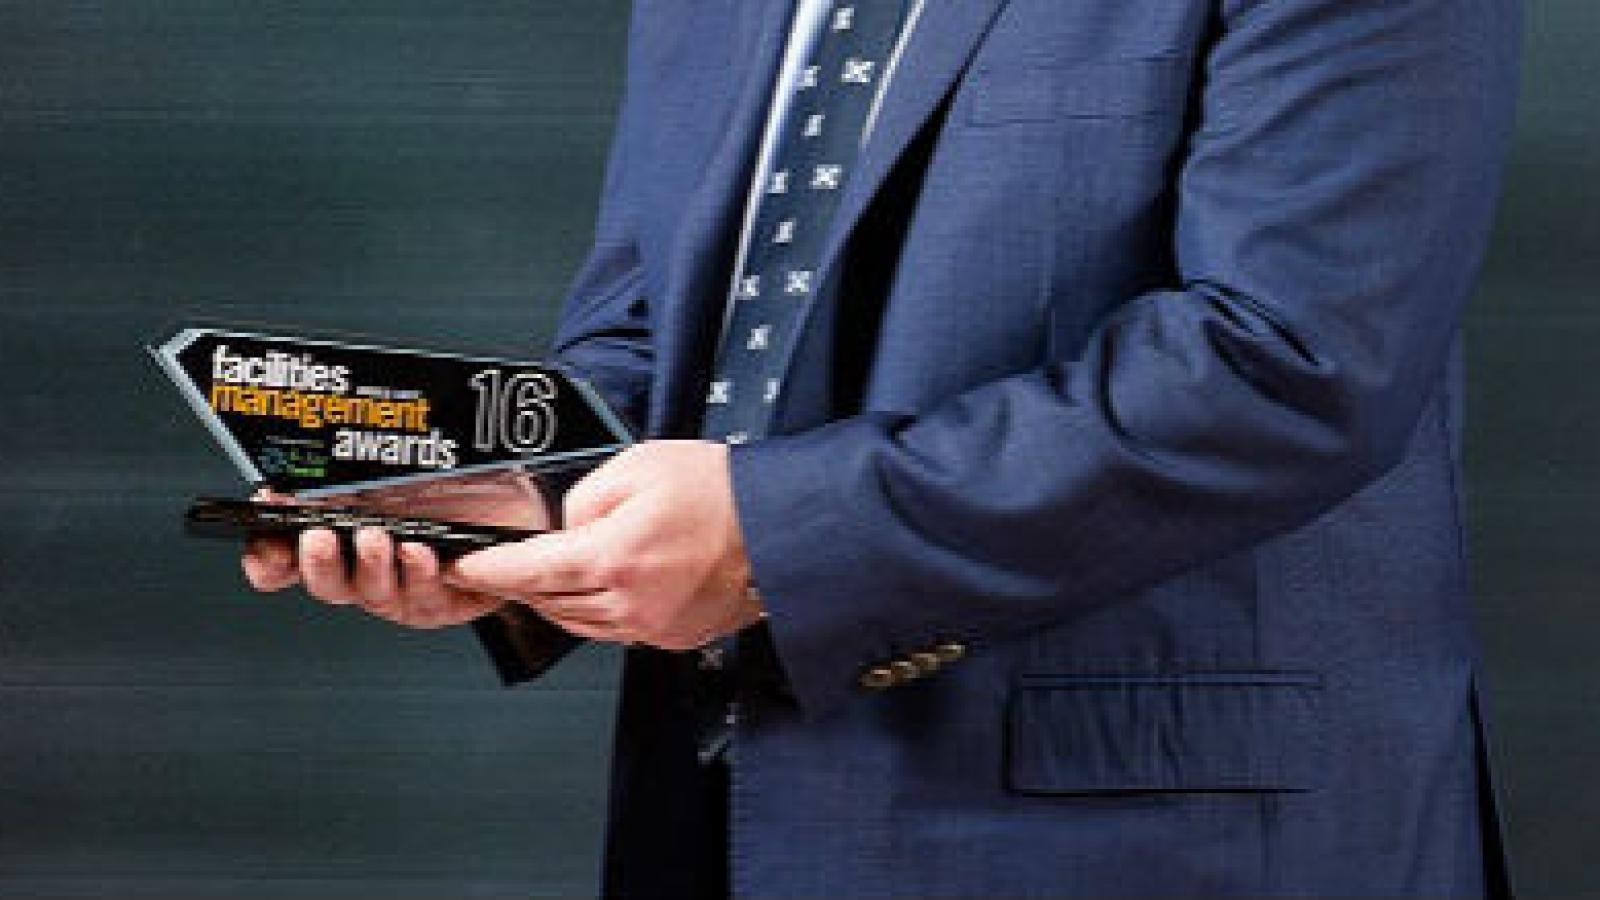 QBG Demonstrate Strength At Facilities Management Awards 2016